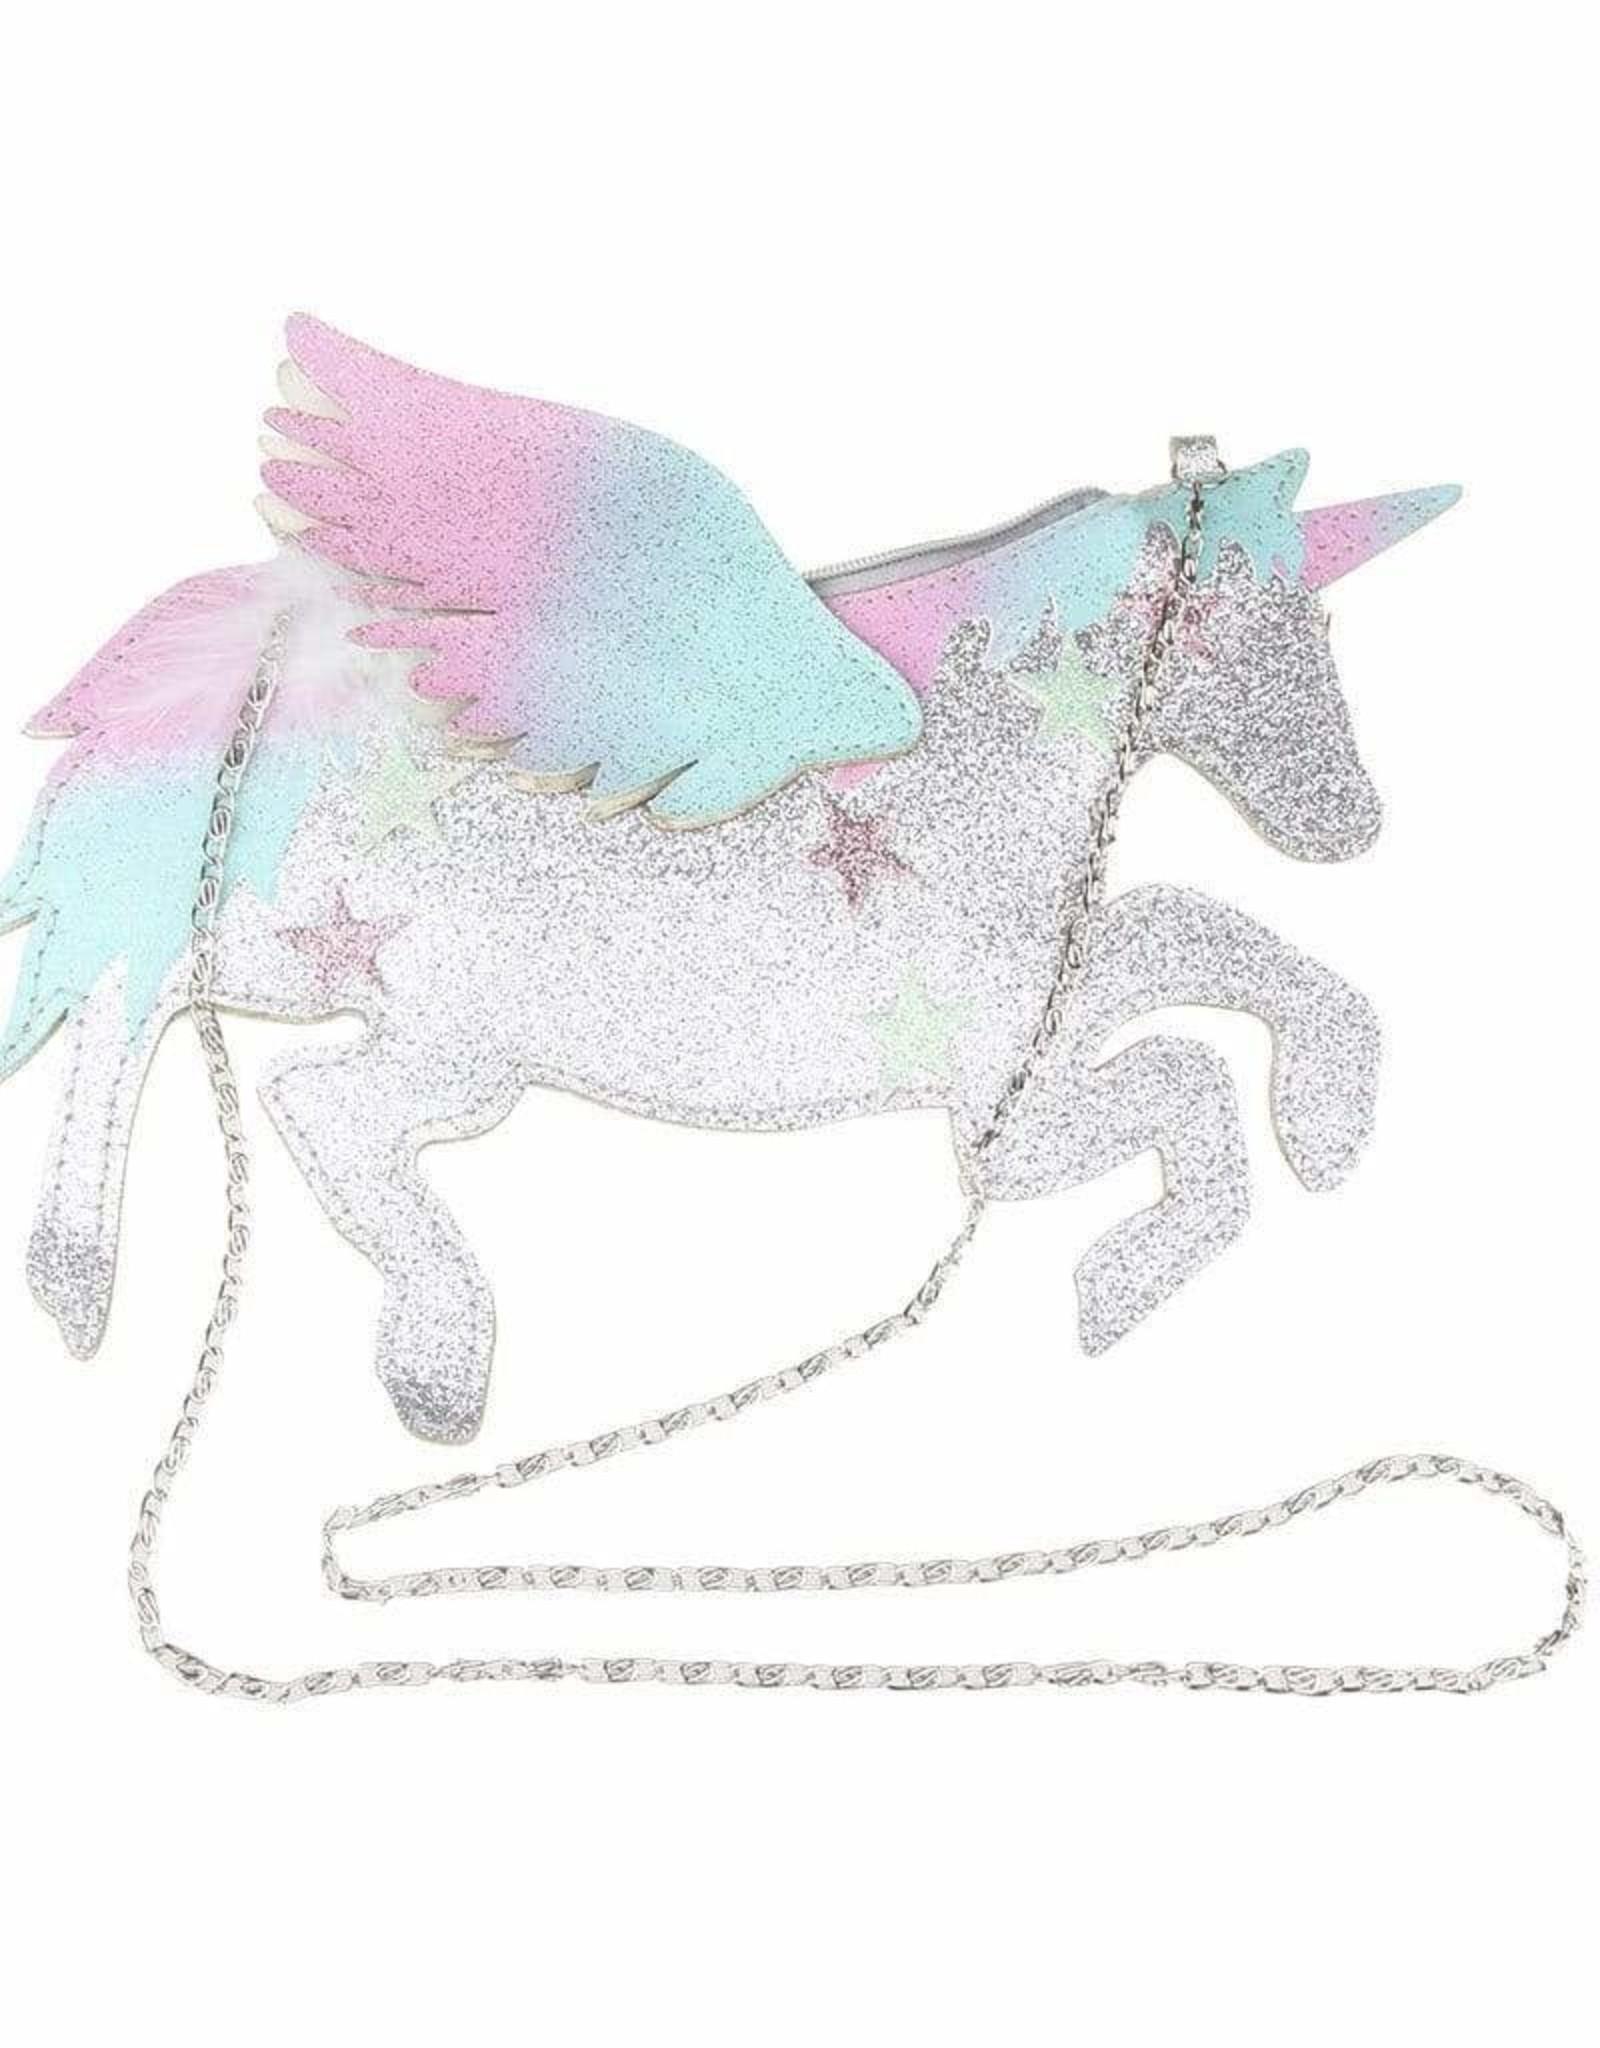 Creative Education Born a Unicorn Handbag  #17